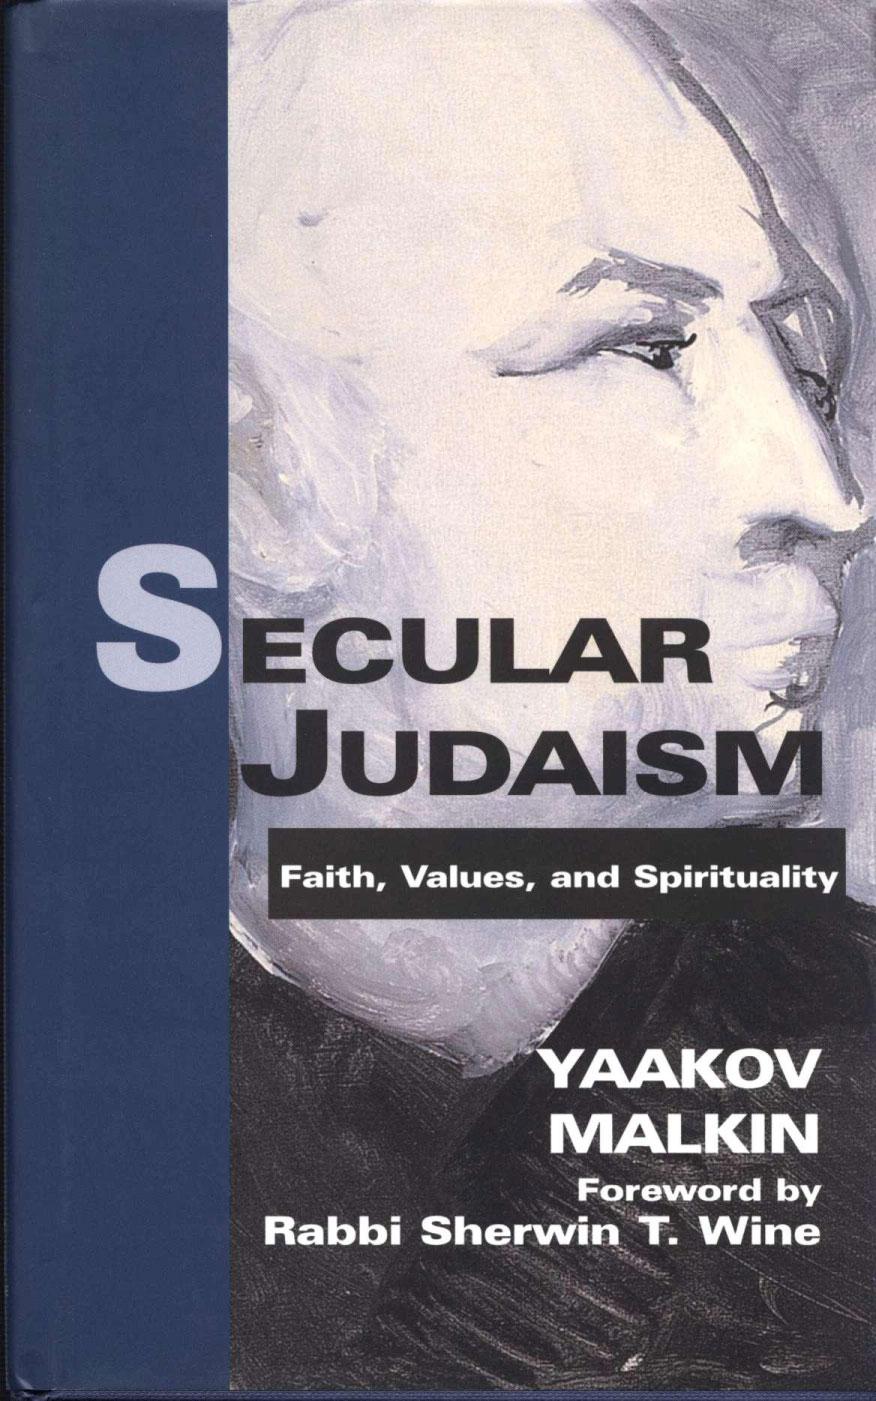 secular judaism - Yaakov Malkin, English, 2004